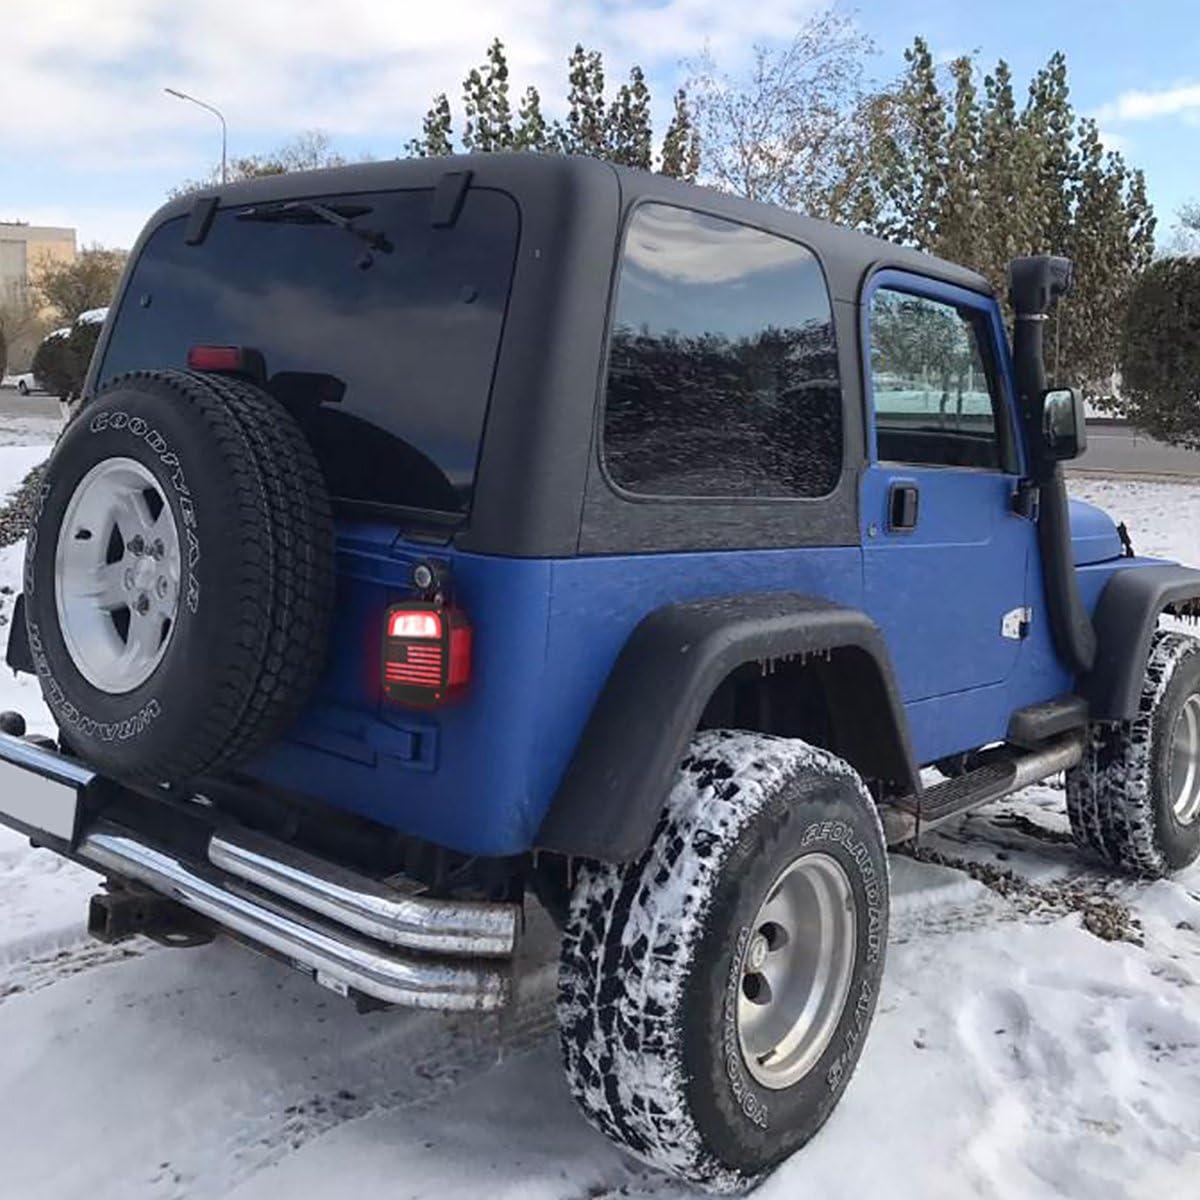 USA Flag Pair RT-TCZ Aluminum Black Rear Taillights Light Guard Tail Light Cover For 1997-2006 Jeep TJ Wrangler